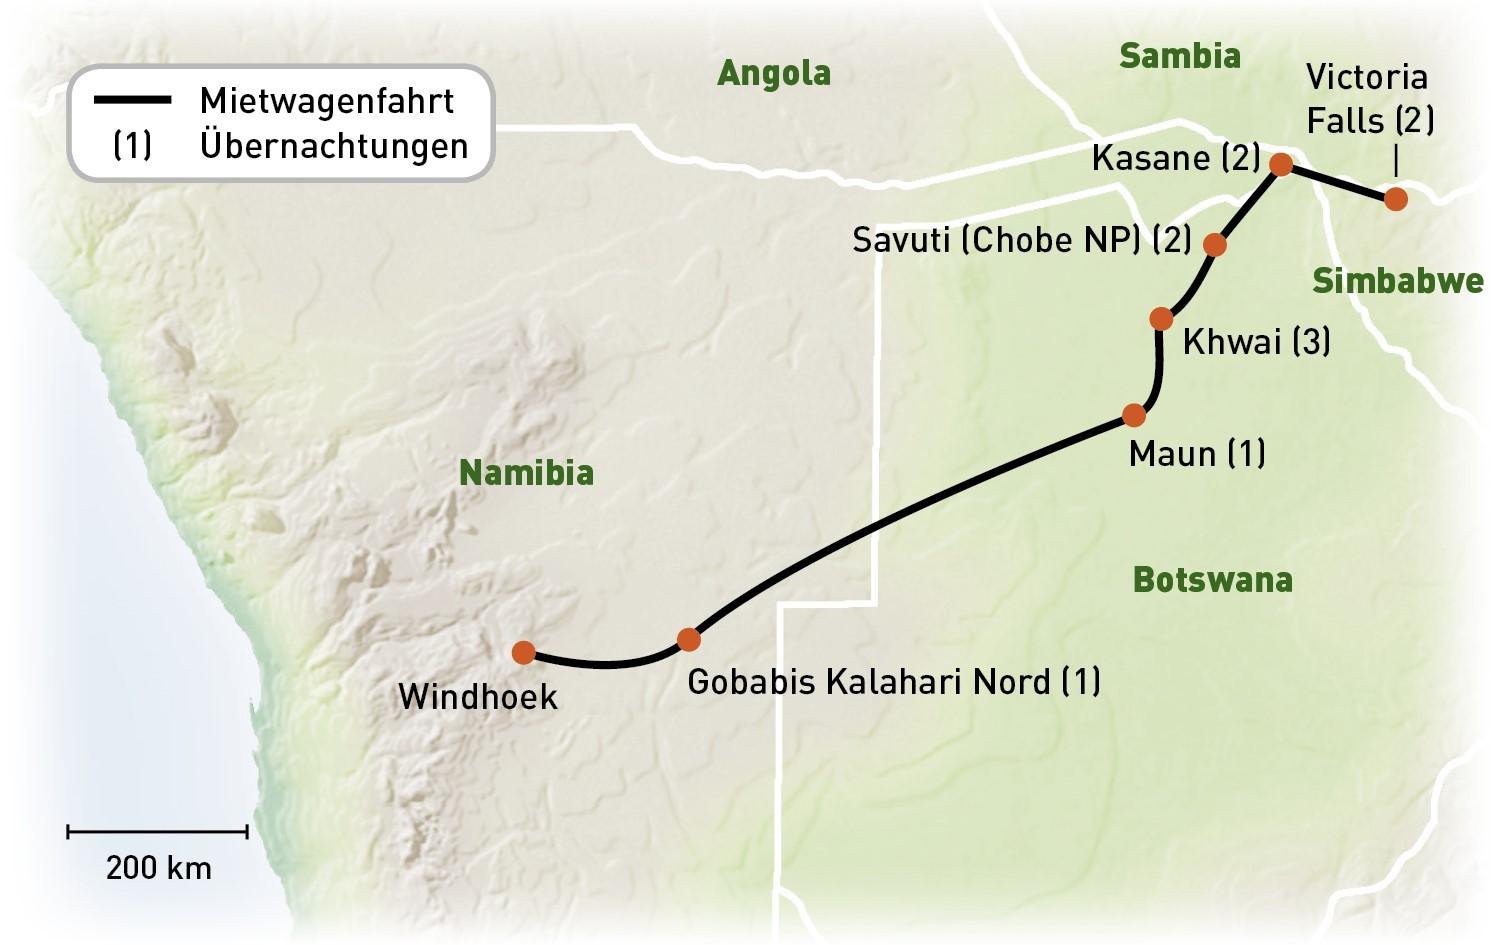 Namibia_Botswana_VictoriaFalls_Mietwagen_KiKa2020_RGB